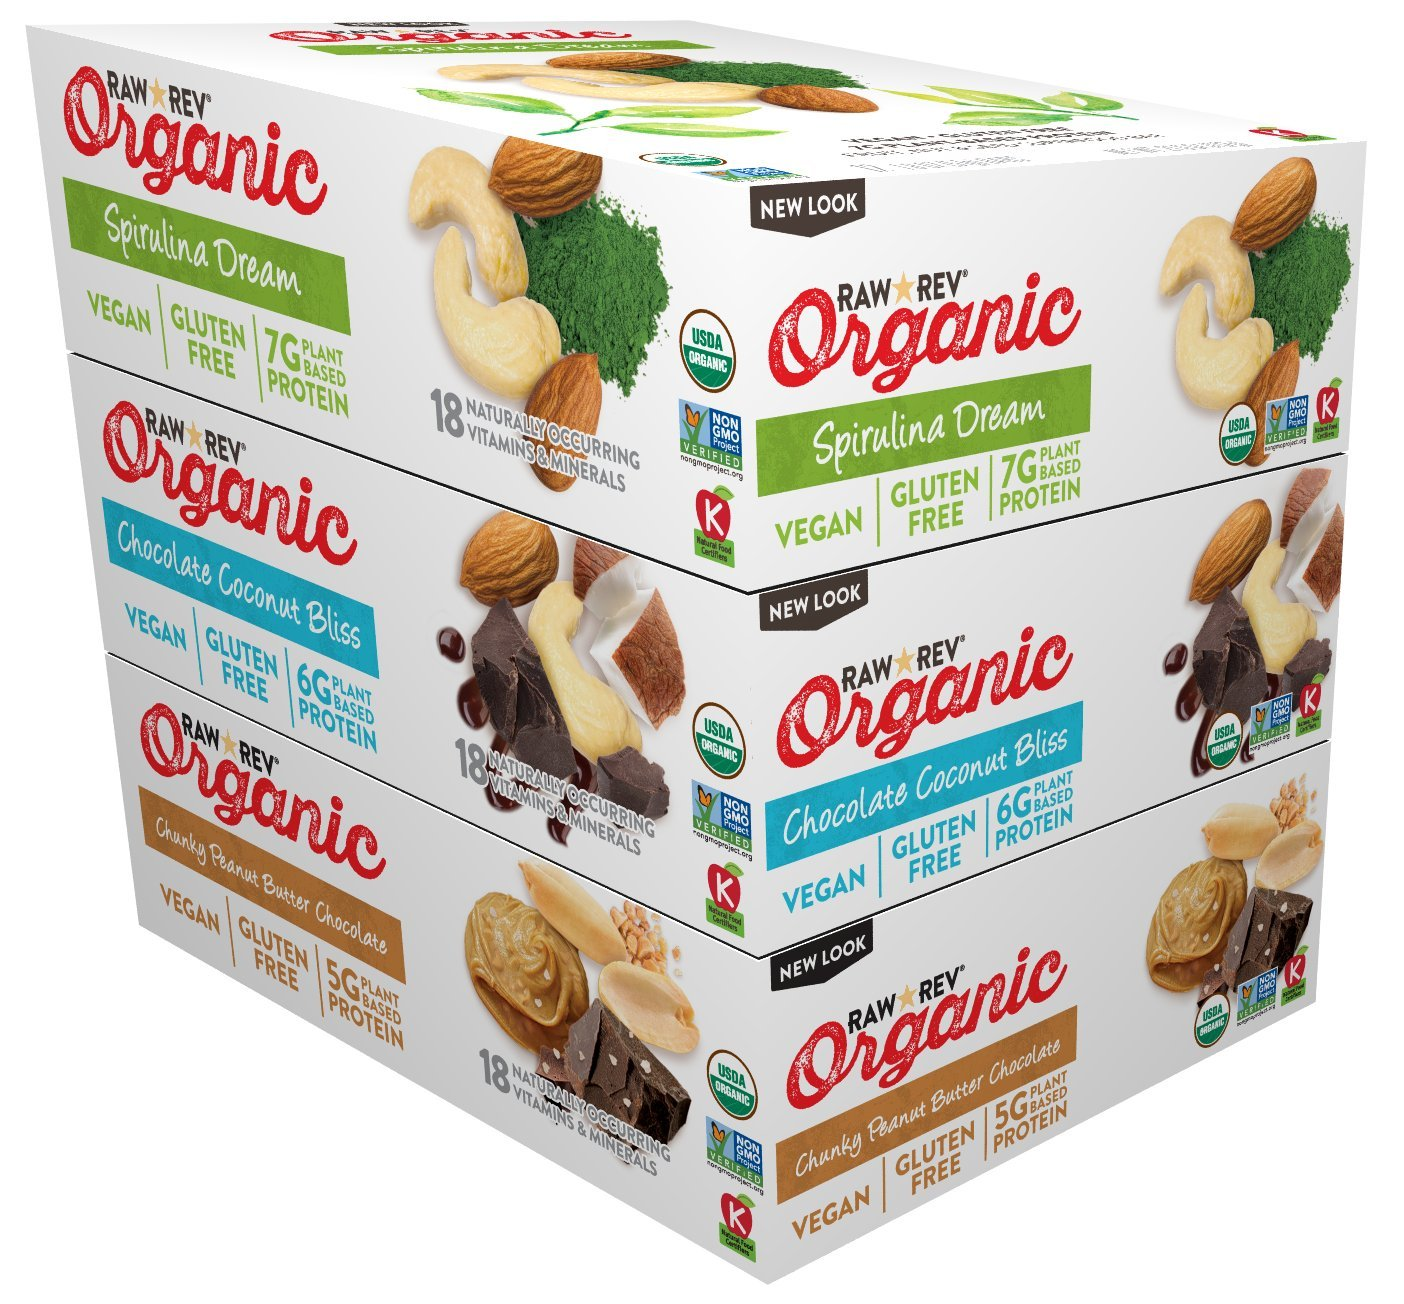 Raw Rev Organic Vegan, Gluten-Free Fruit, Nut, Seed Bars – Organic Best Sellers Variety 3-Pack (Spirulina Dream, Chocolate Coconut Bliss, Chunky Peanut Butter Chocolate)